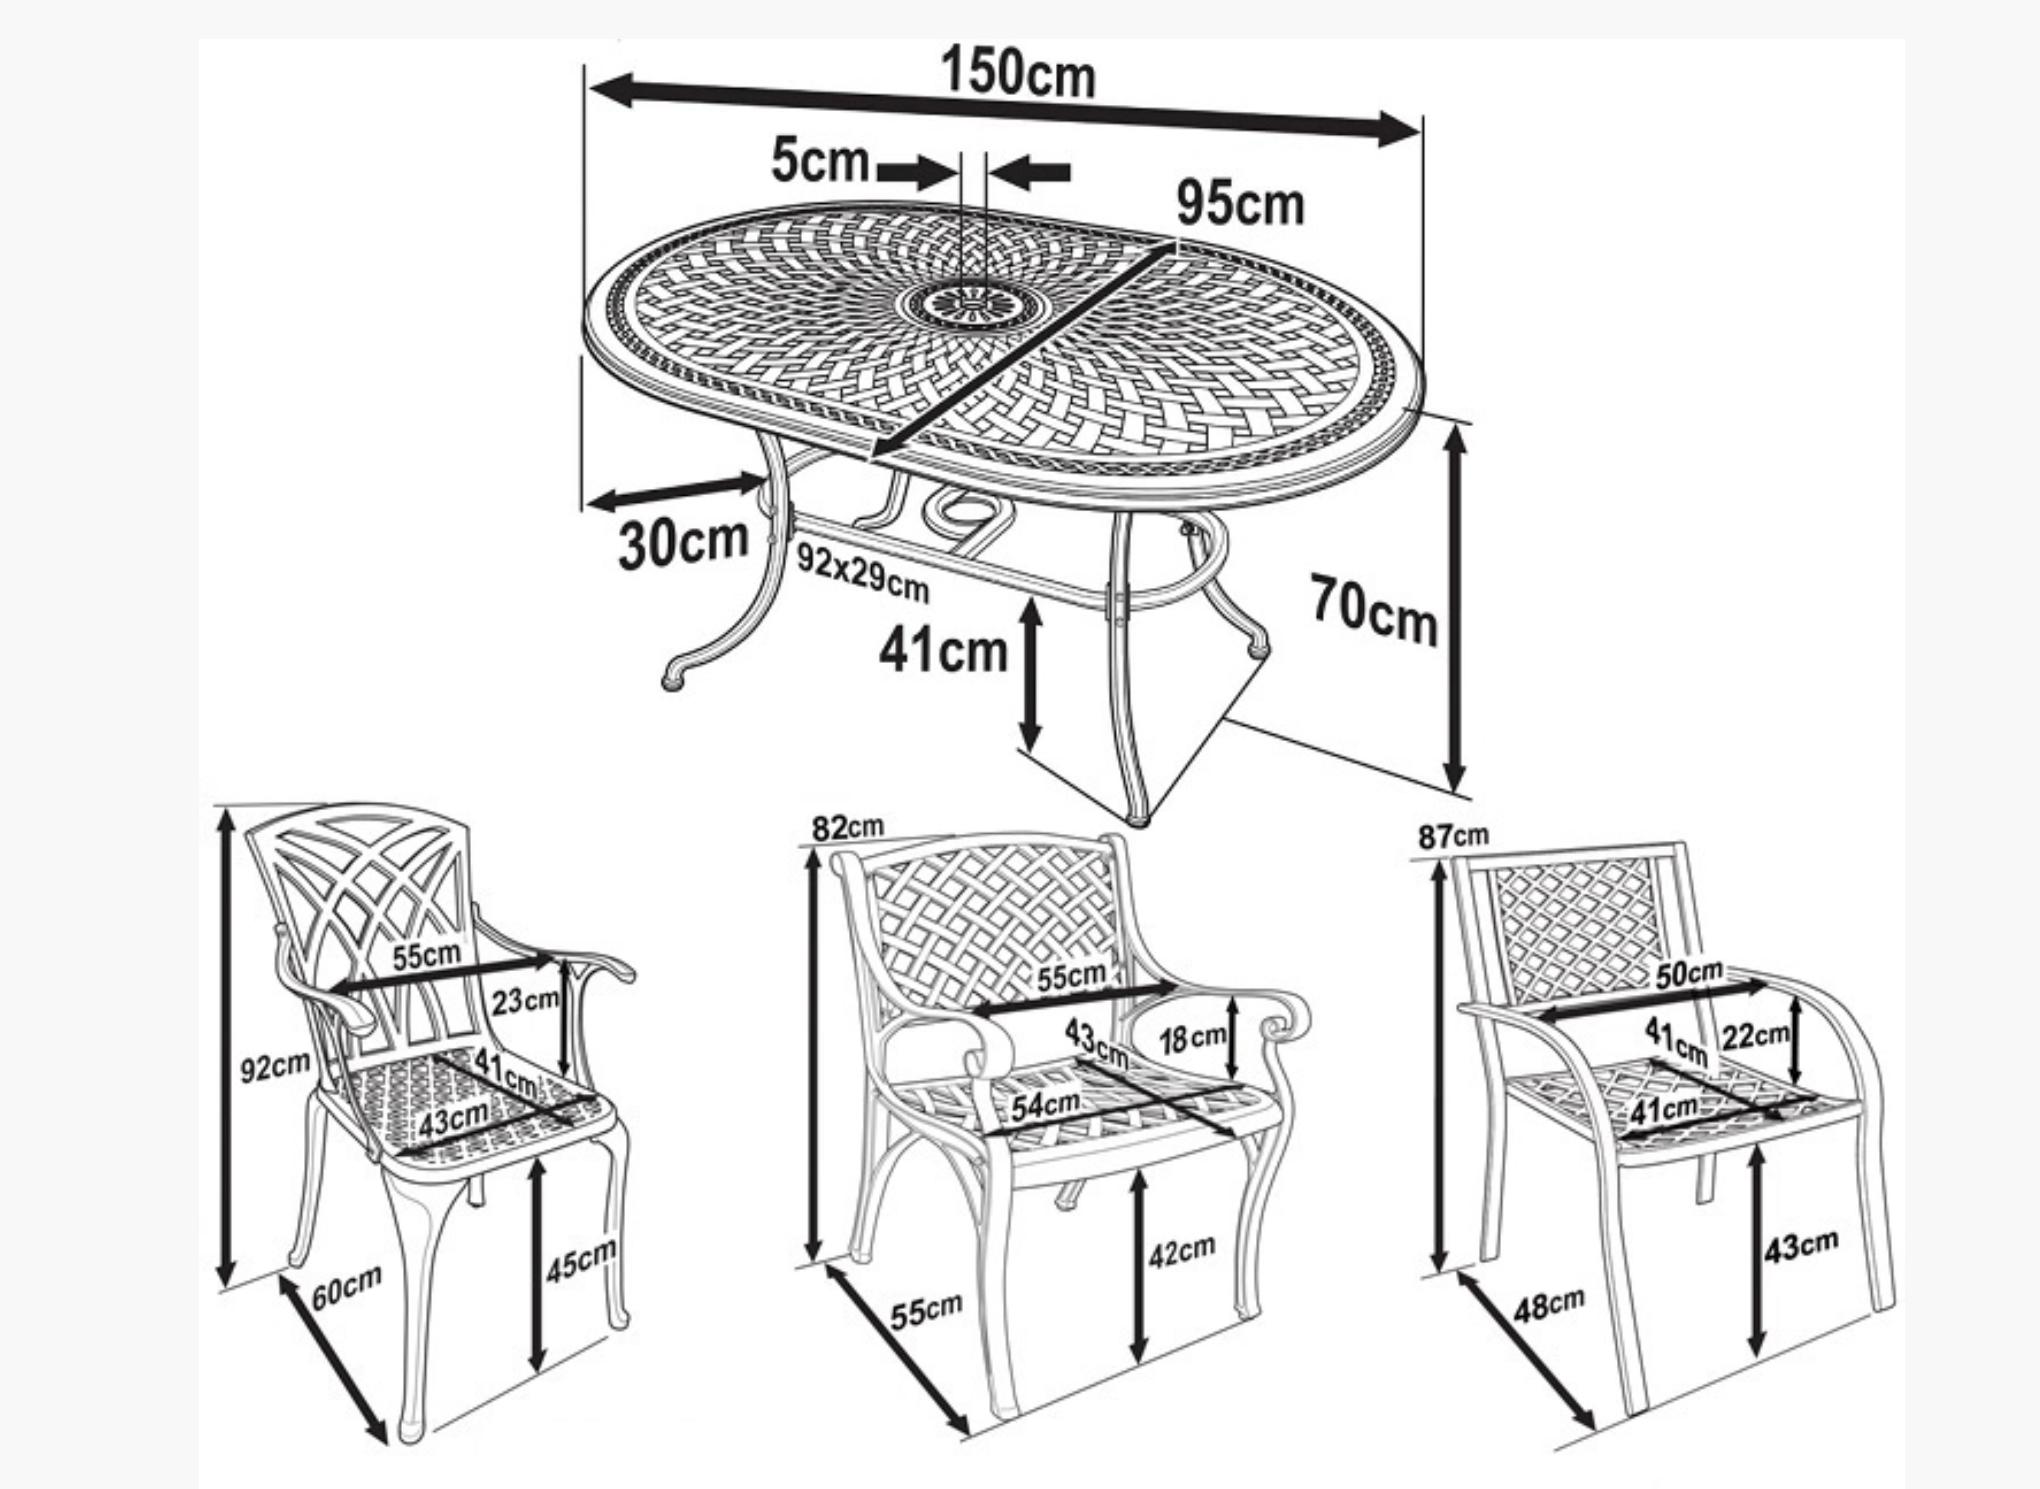 June Garden Table Dimensions